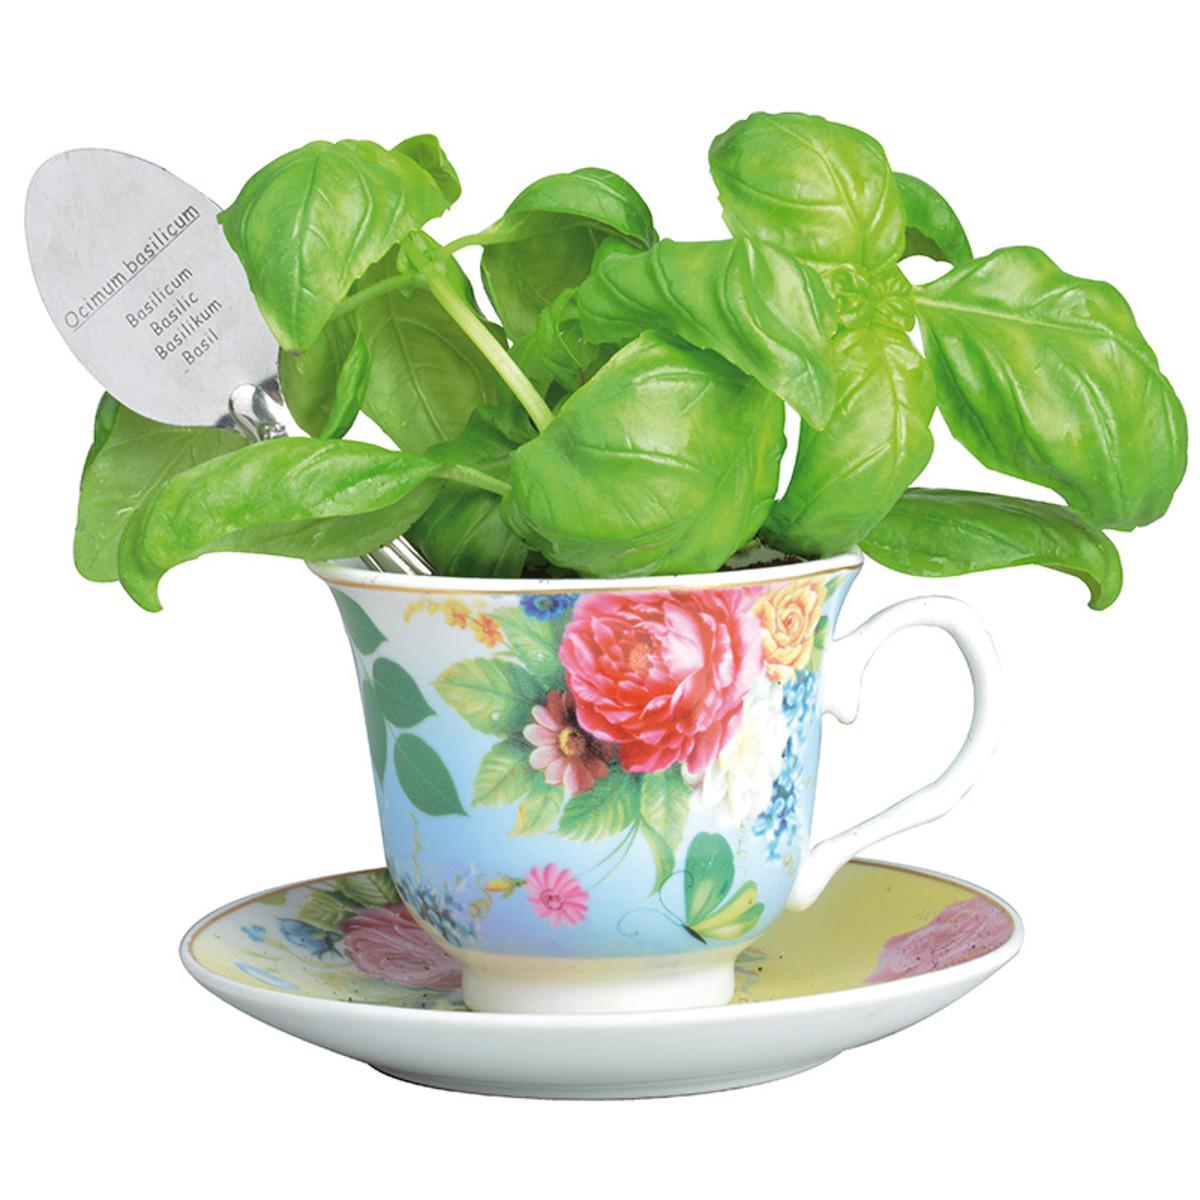 "Anzuchtset ""Teetasse"" mit Basilikum"